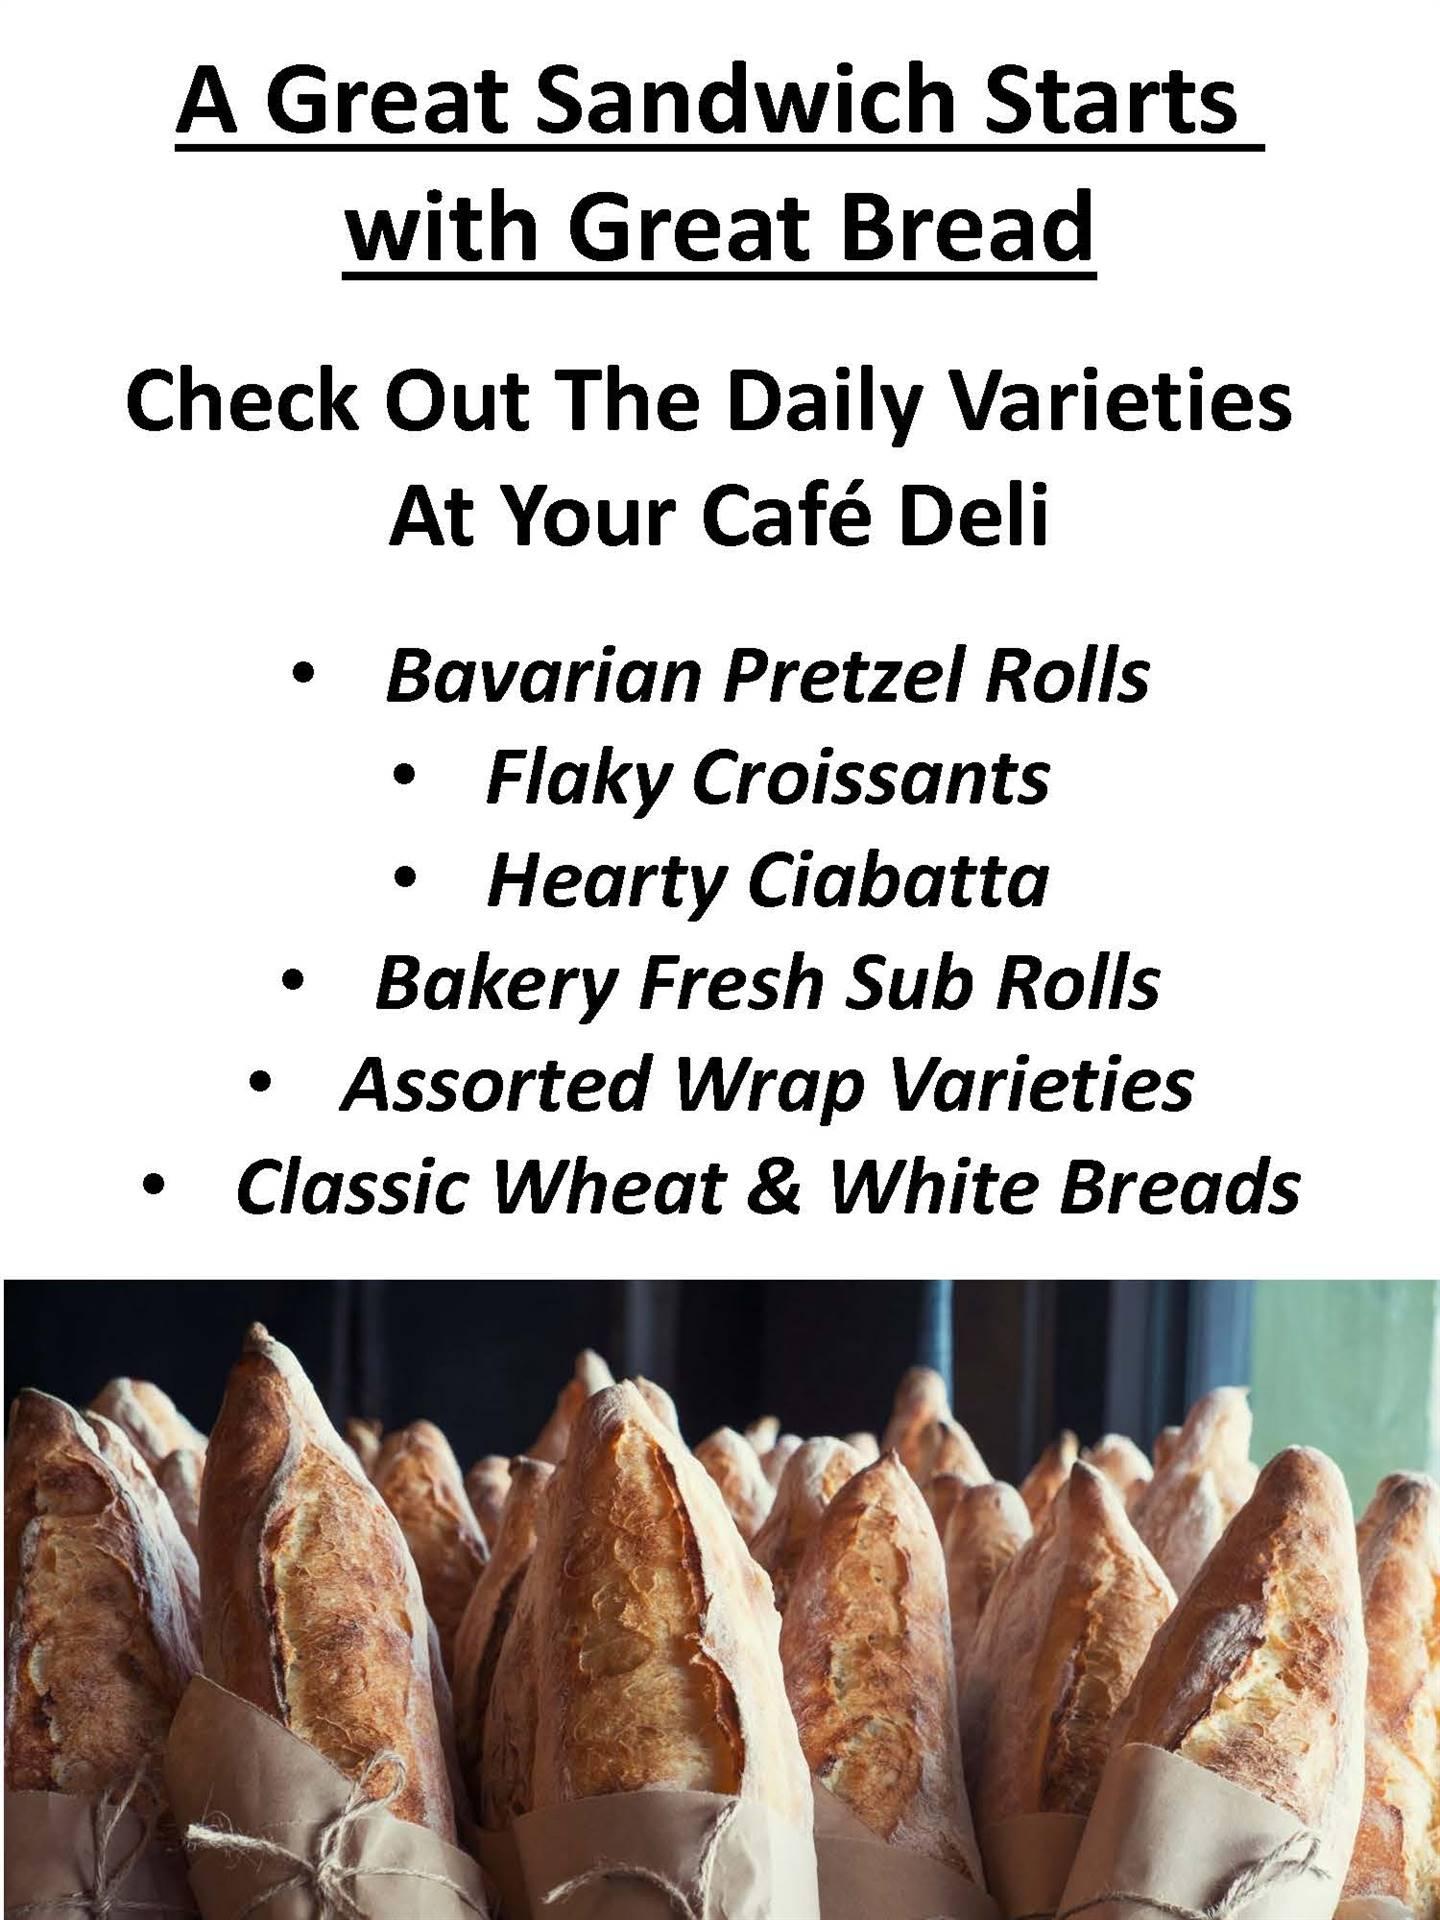 Bread Marketing